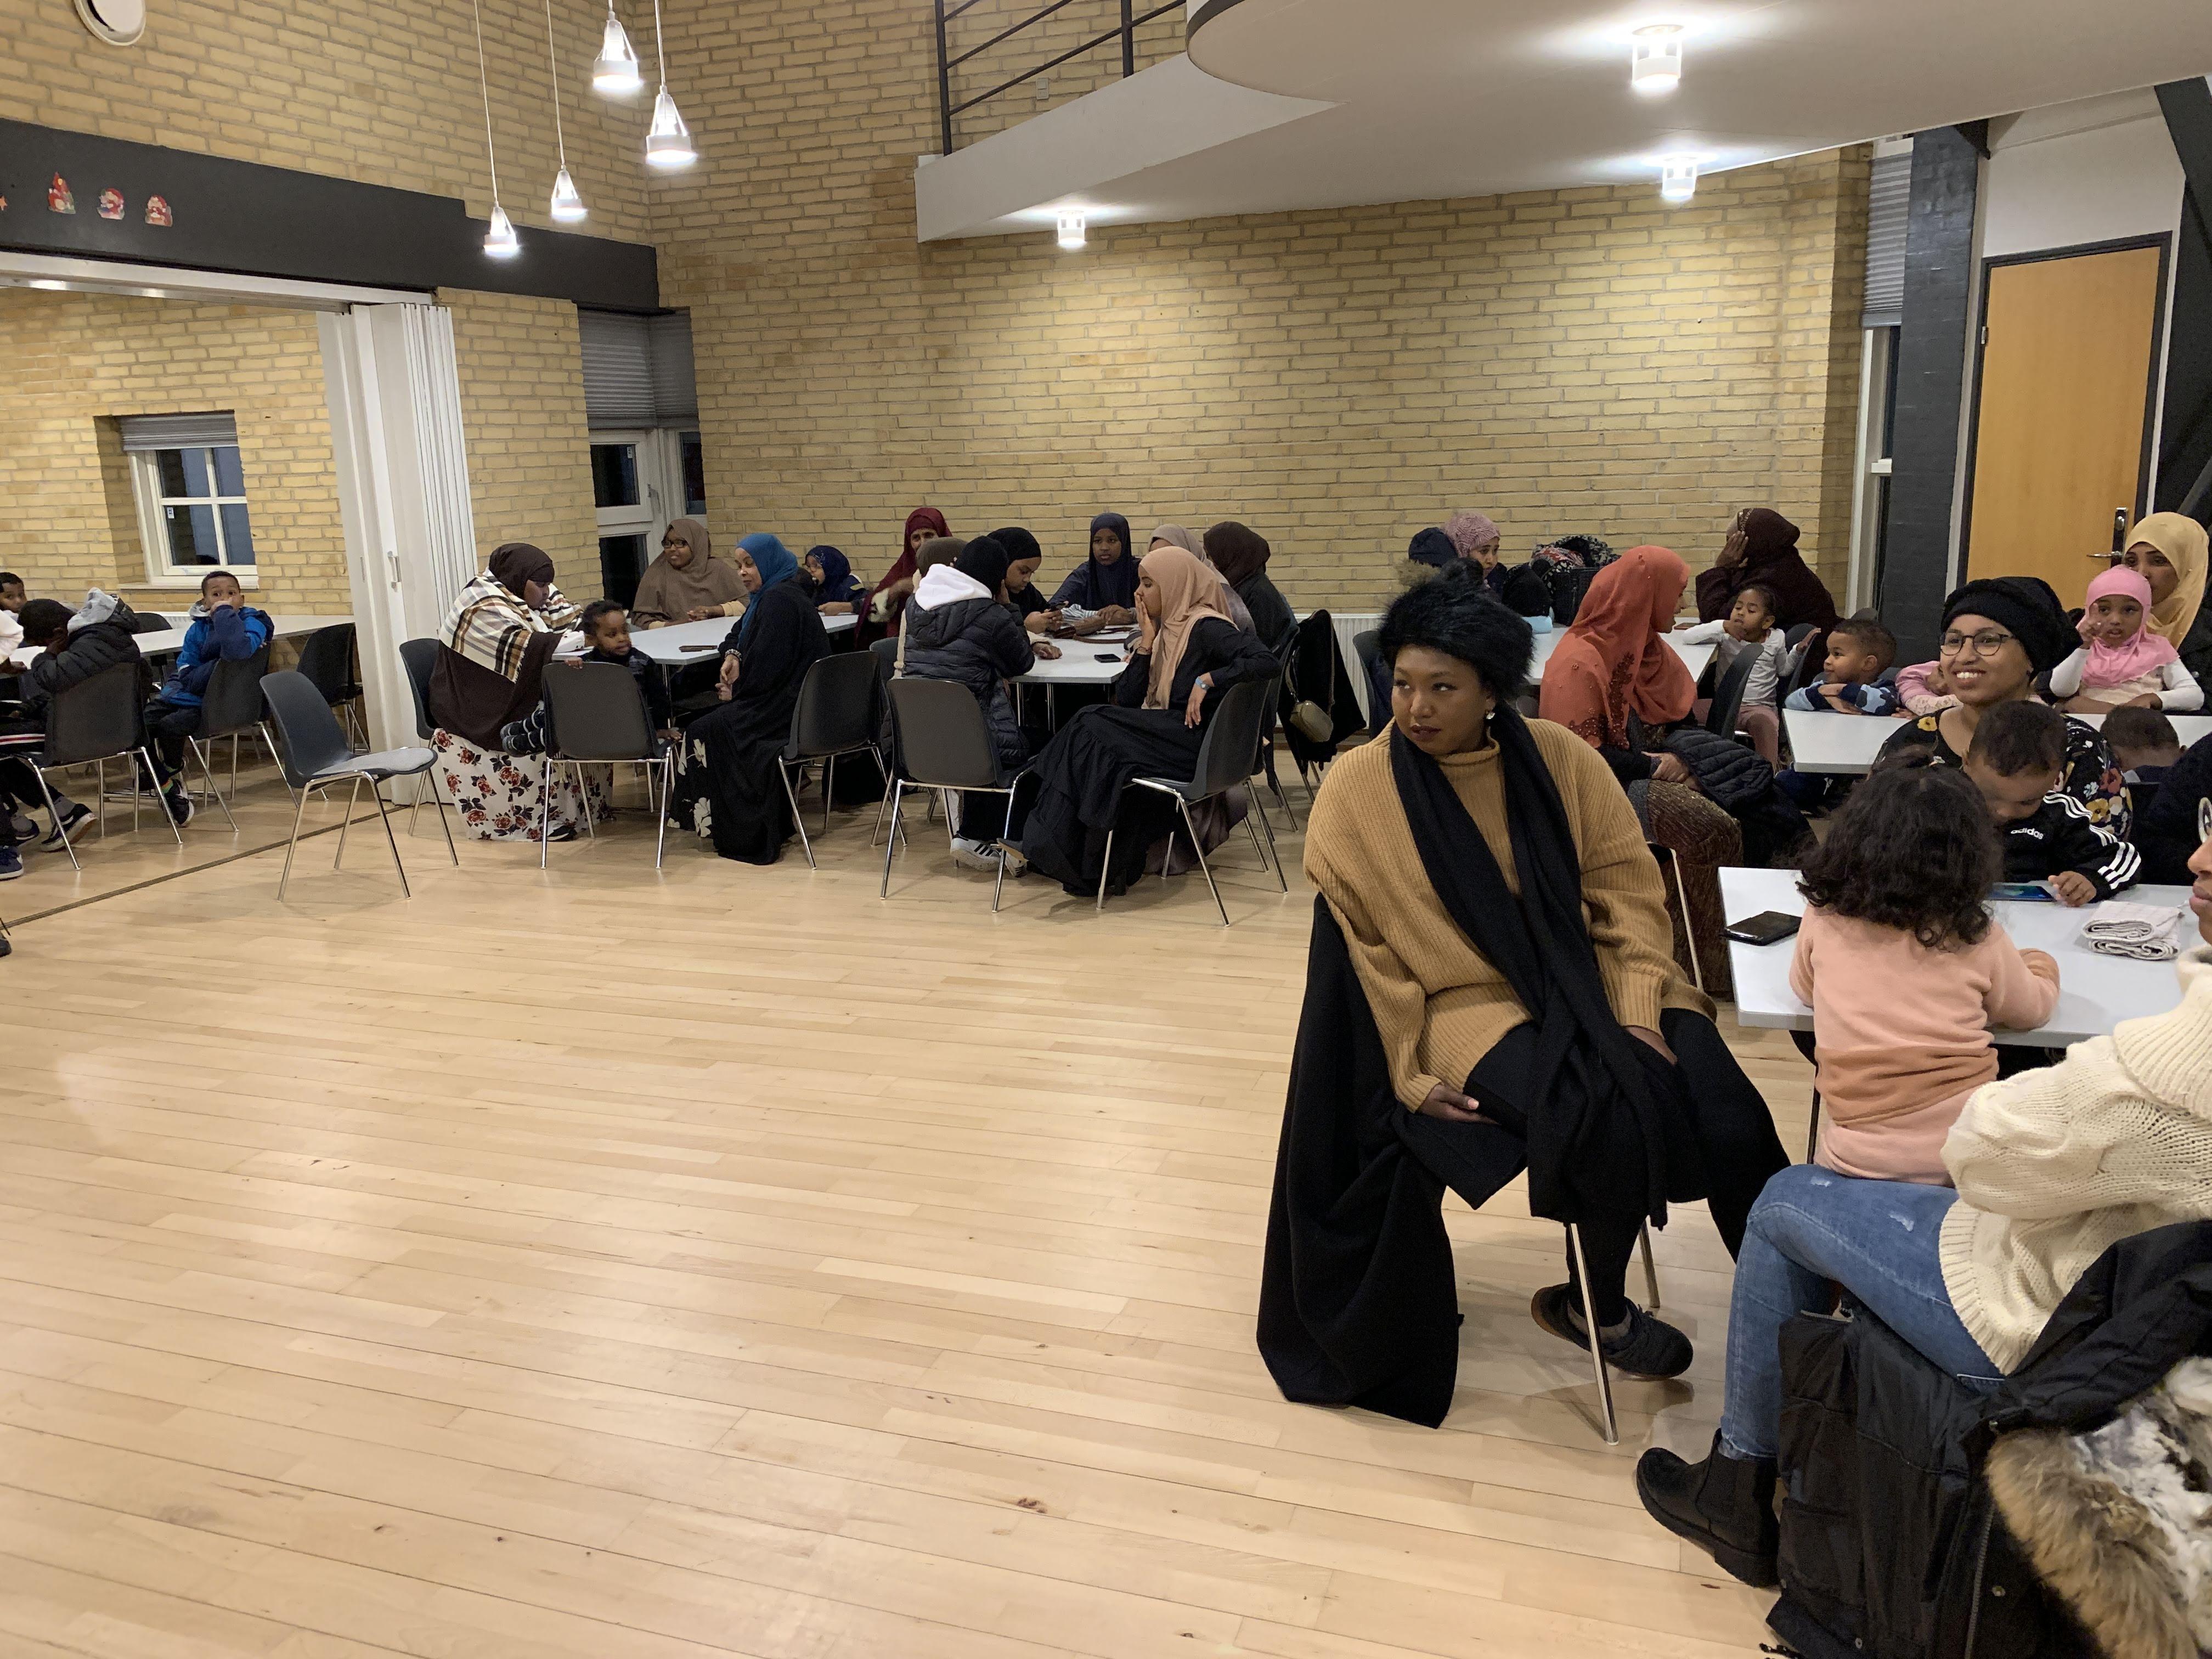 fællesspisning-den-28-12-2019-i-beboerhuset-på-Ellekonebakken-018